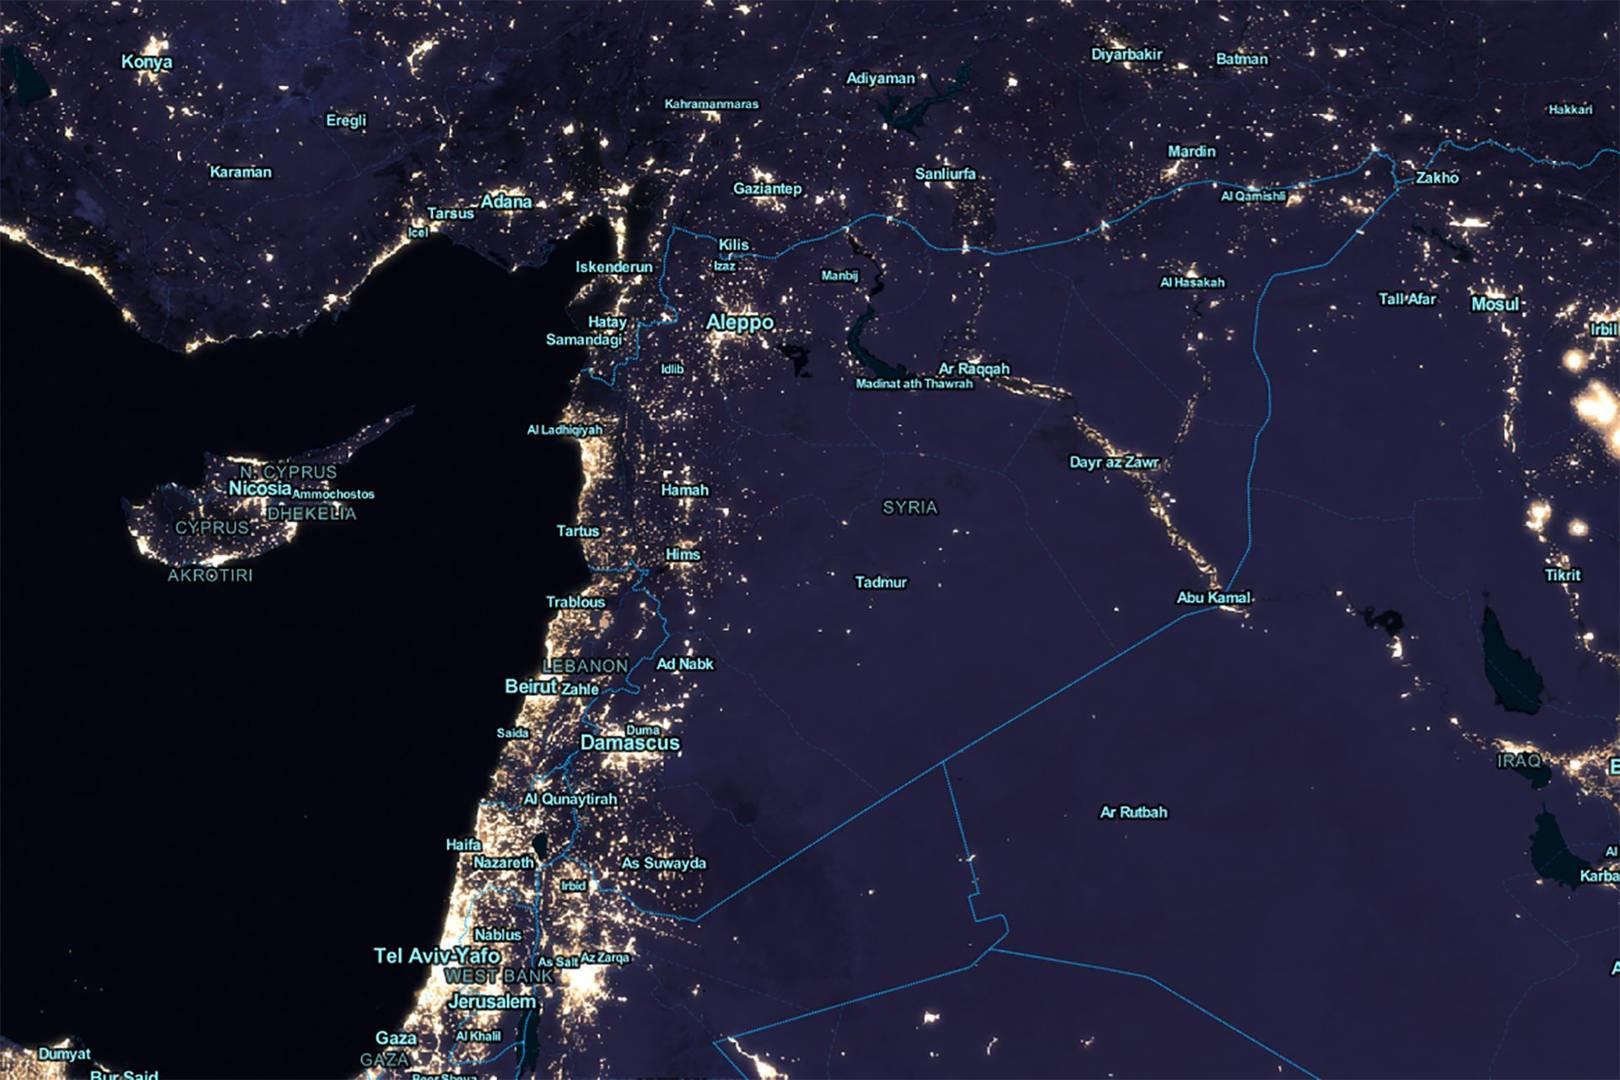 Nasas black marble map features satellite images of the earth at nasas black marble map features satellite images of the earth at night wired uk sciox Choice Image